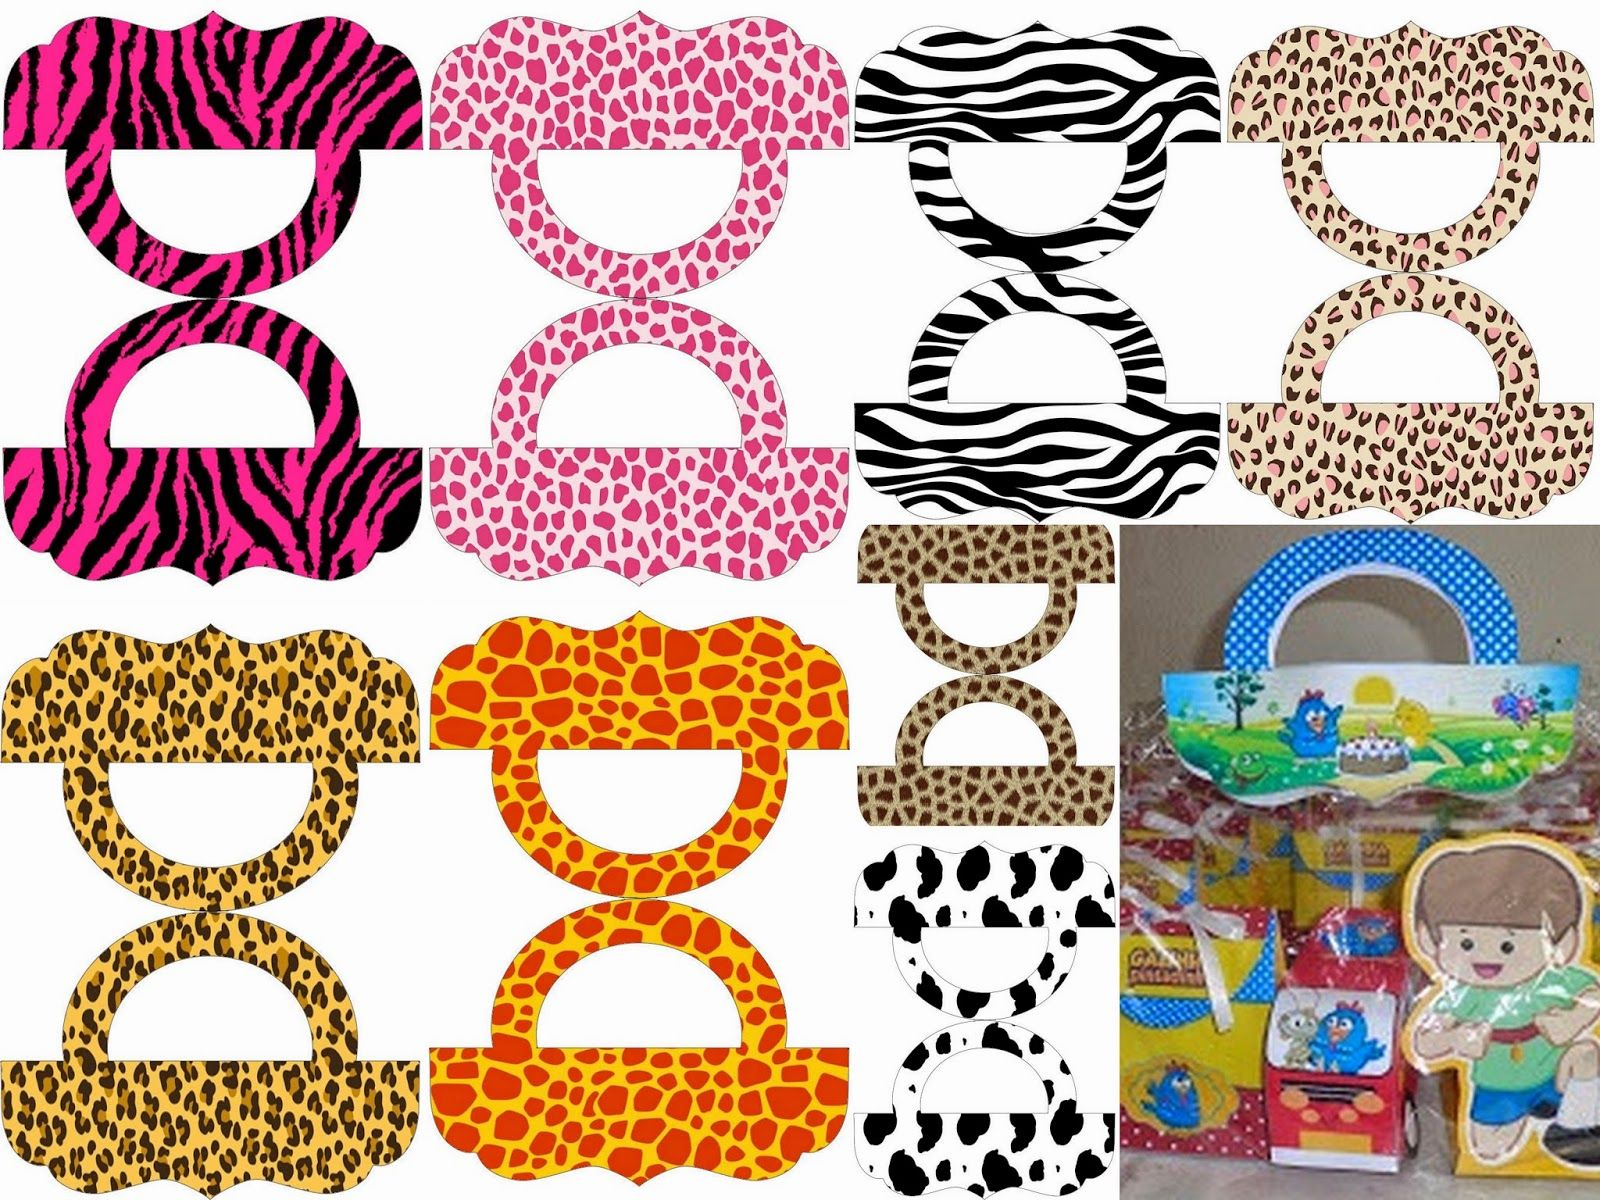 Pieles De Animales Etiquetas Para Bolsas De Golosinas Para Imprimir Gratis Bolsas De Golosinas Etiquetas Personalizadas Para Imprimir Etiquetas Para Imprimir